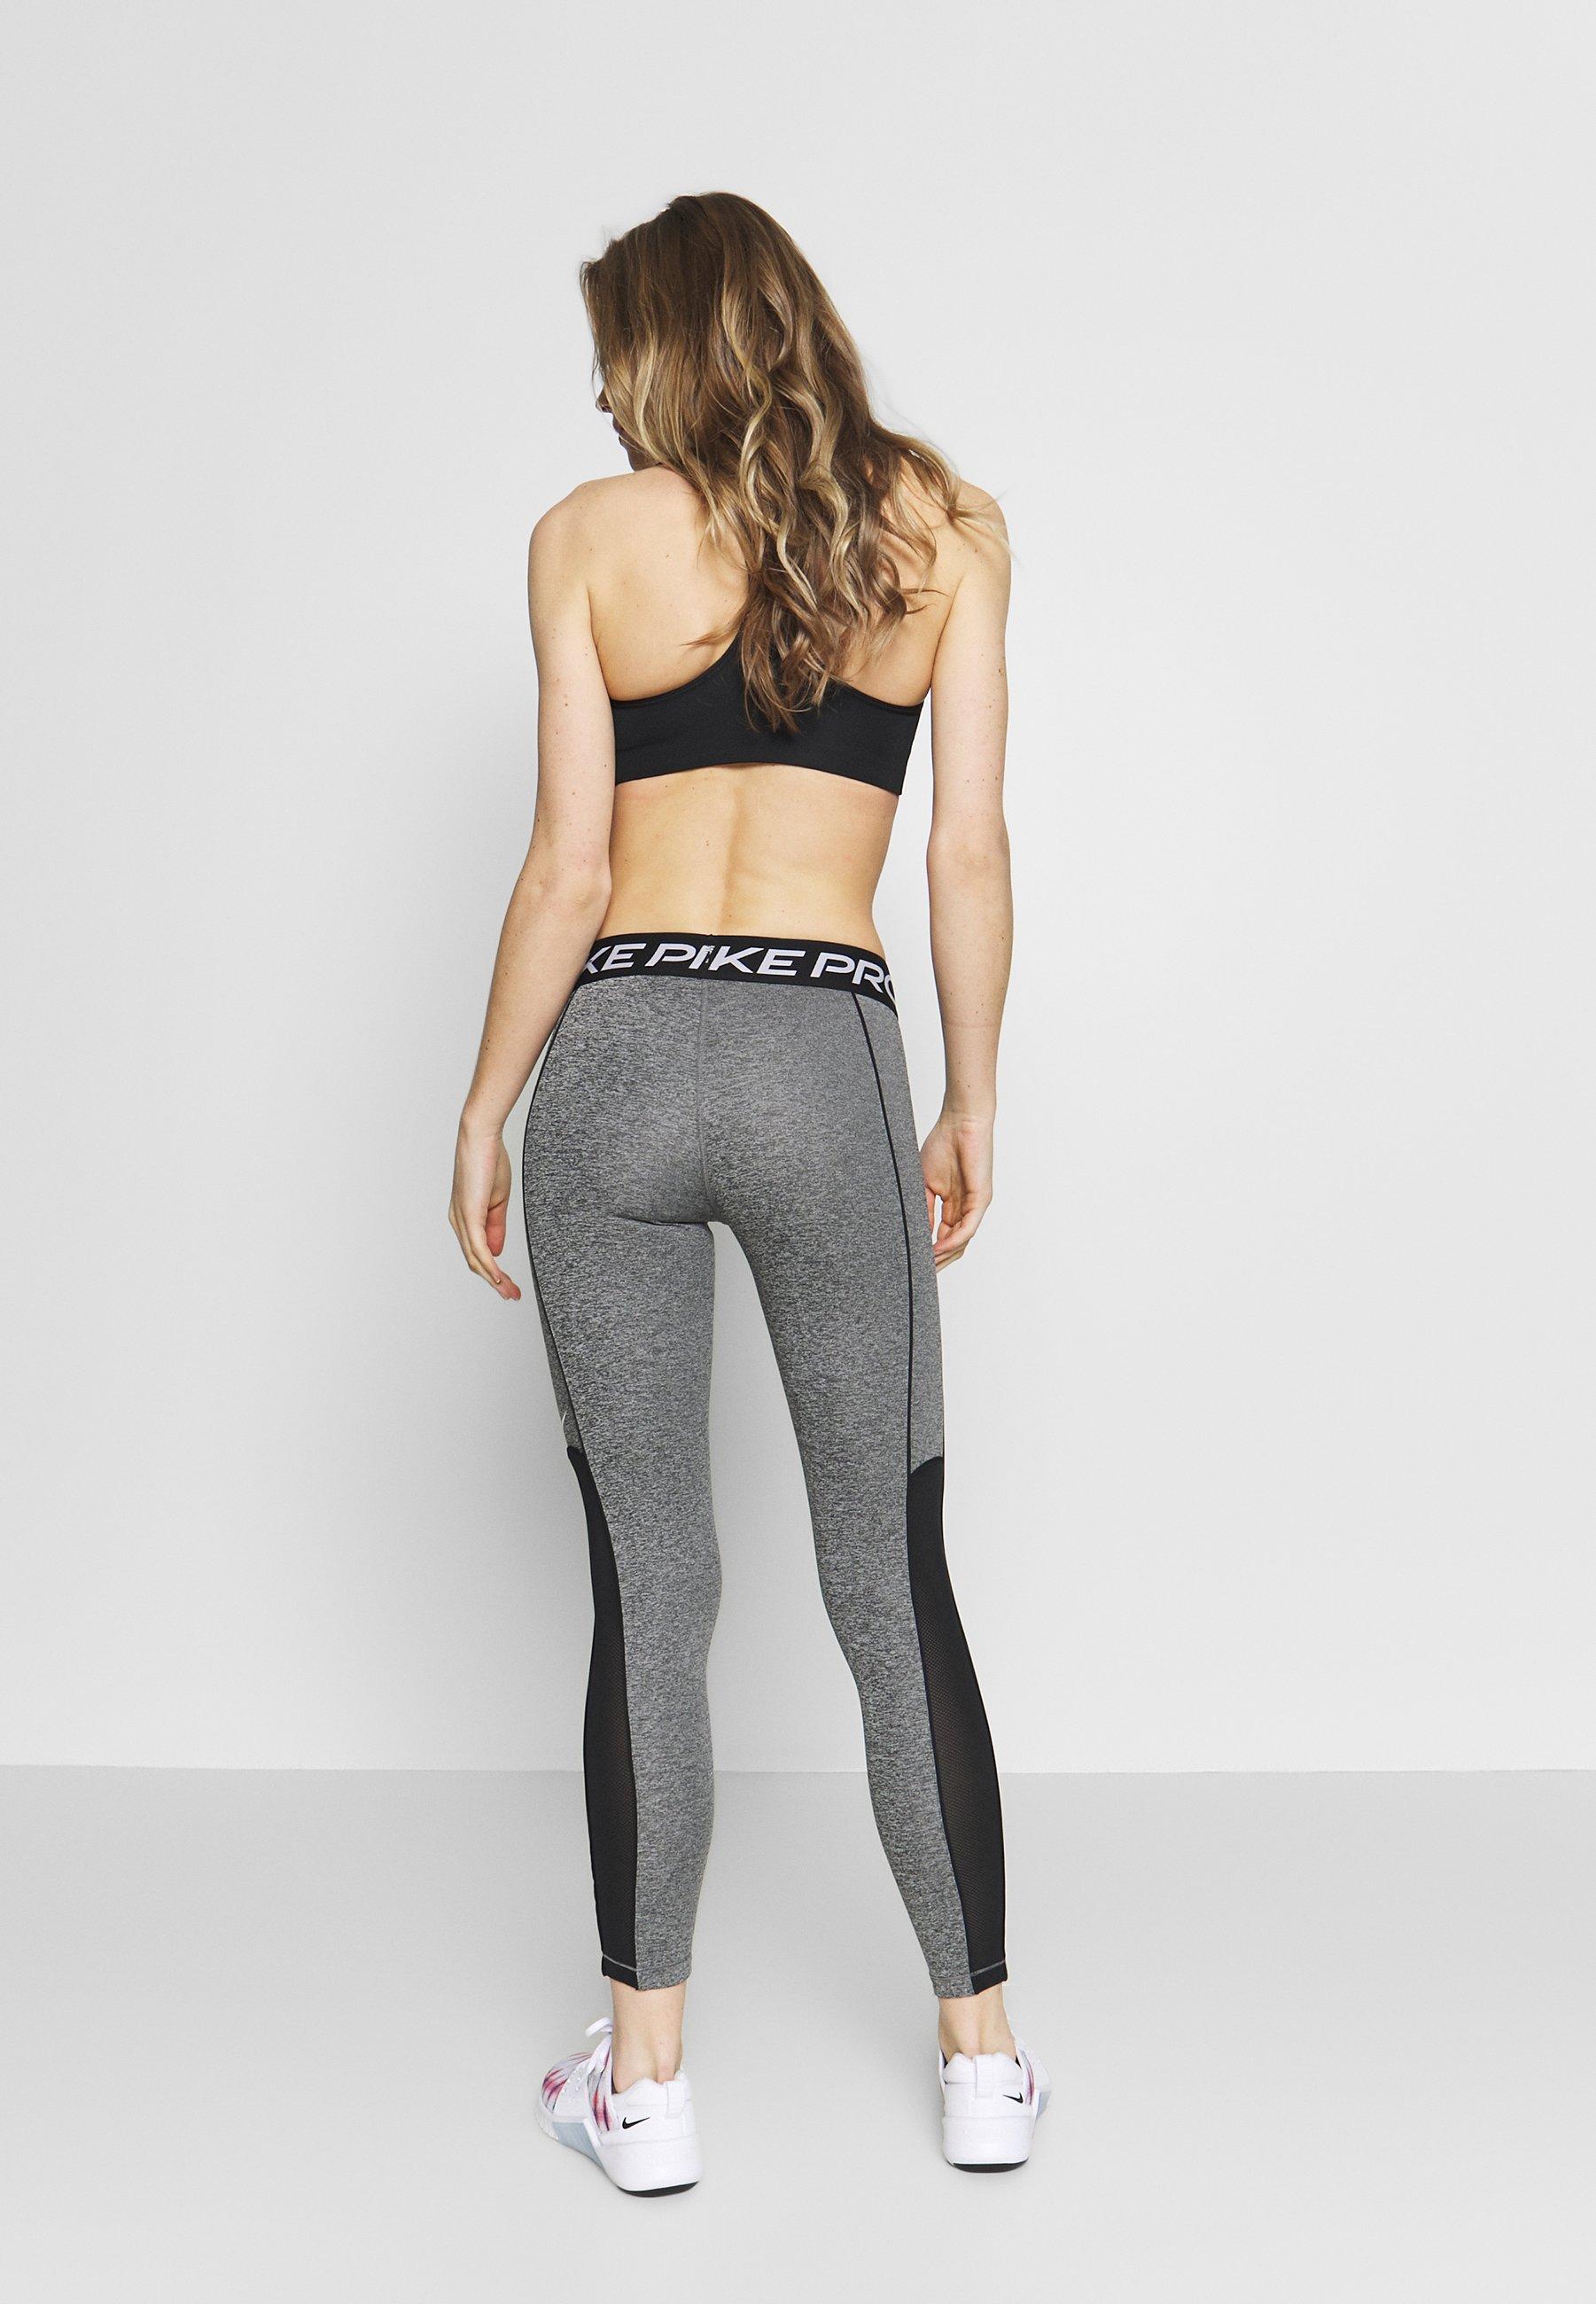 Nike Performance W NP TGHT SPACE DYE - Collant - cerulean/fire pink/black/white SSZKvRD0